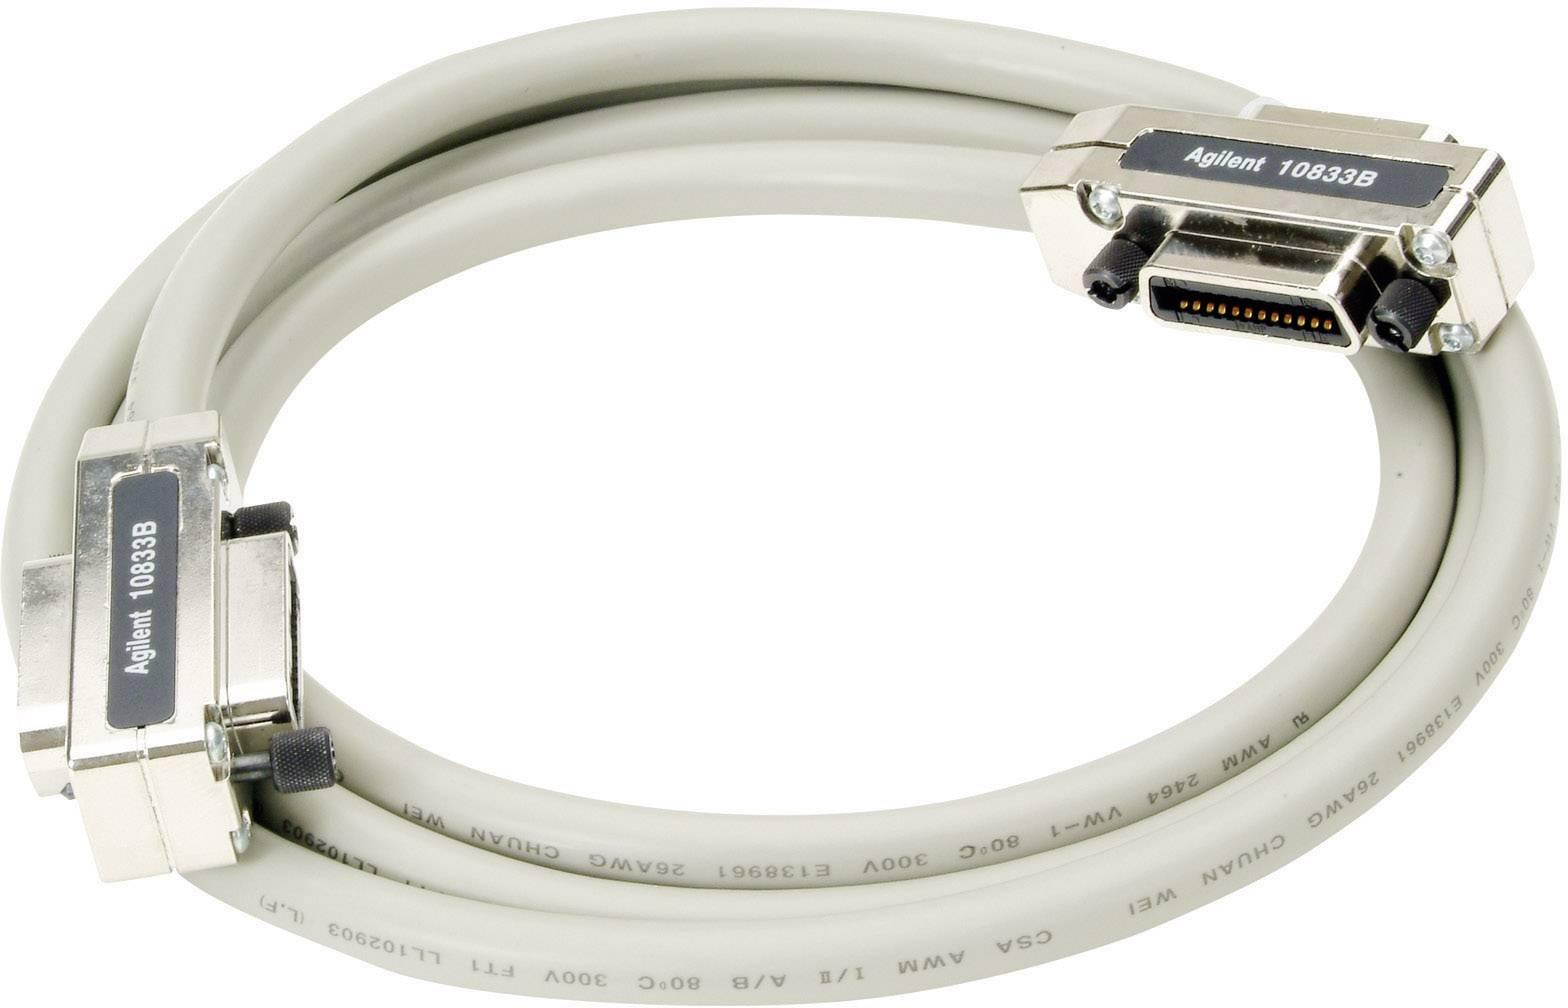 Kábel Agilent Technologies 10833C, 4 m